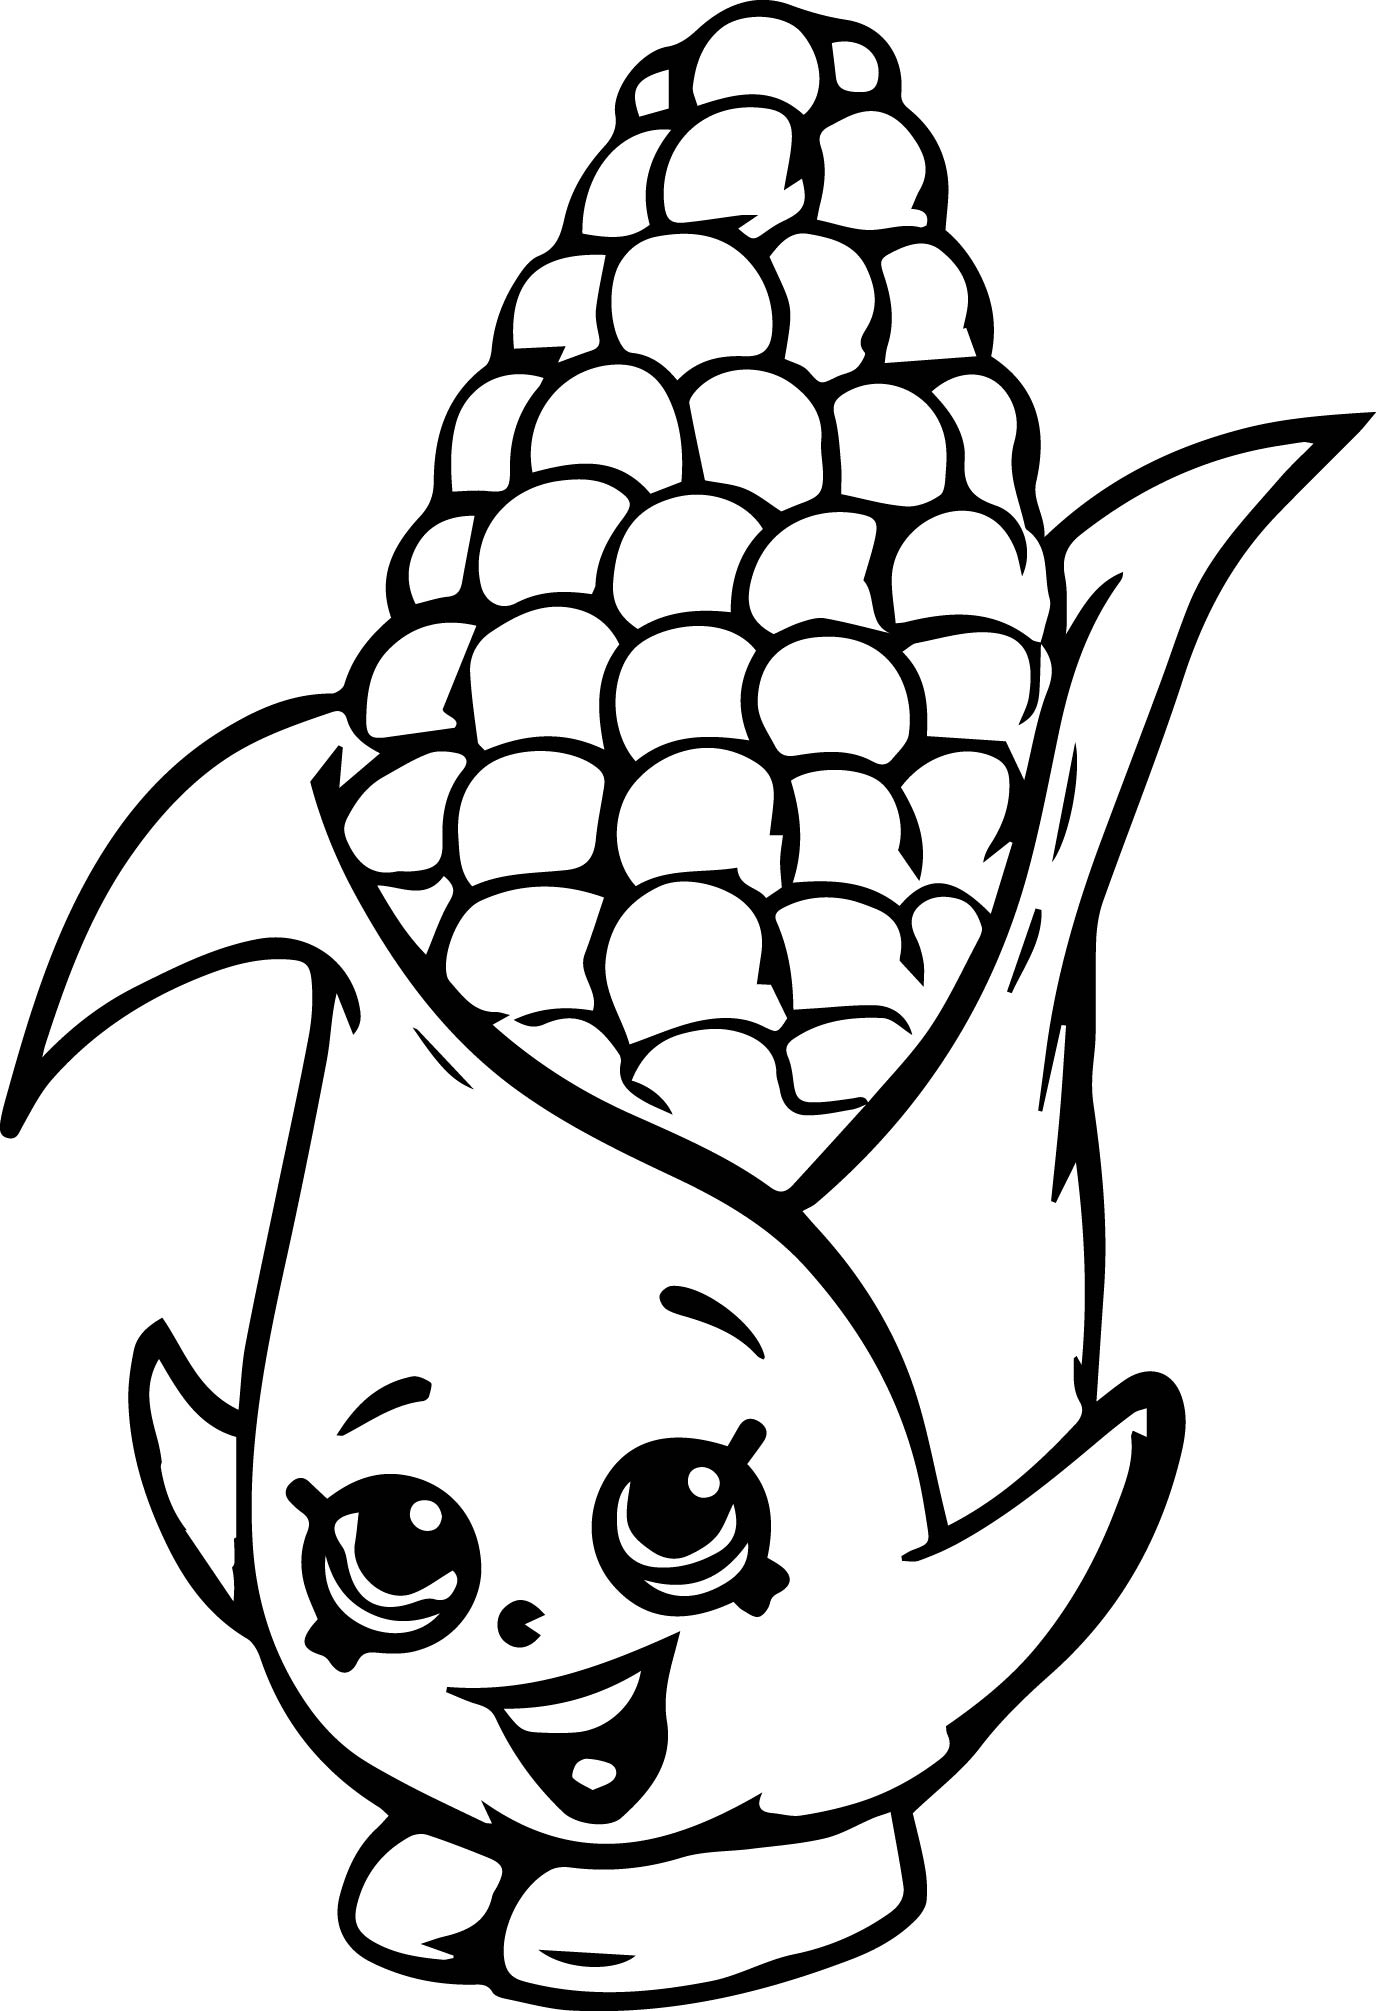 Corny Cob Coloring Page Wecoloringpage Com